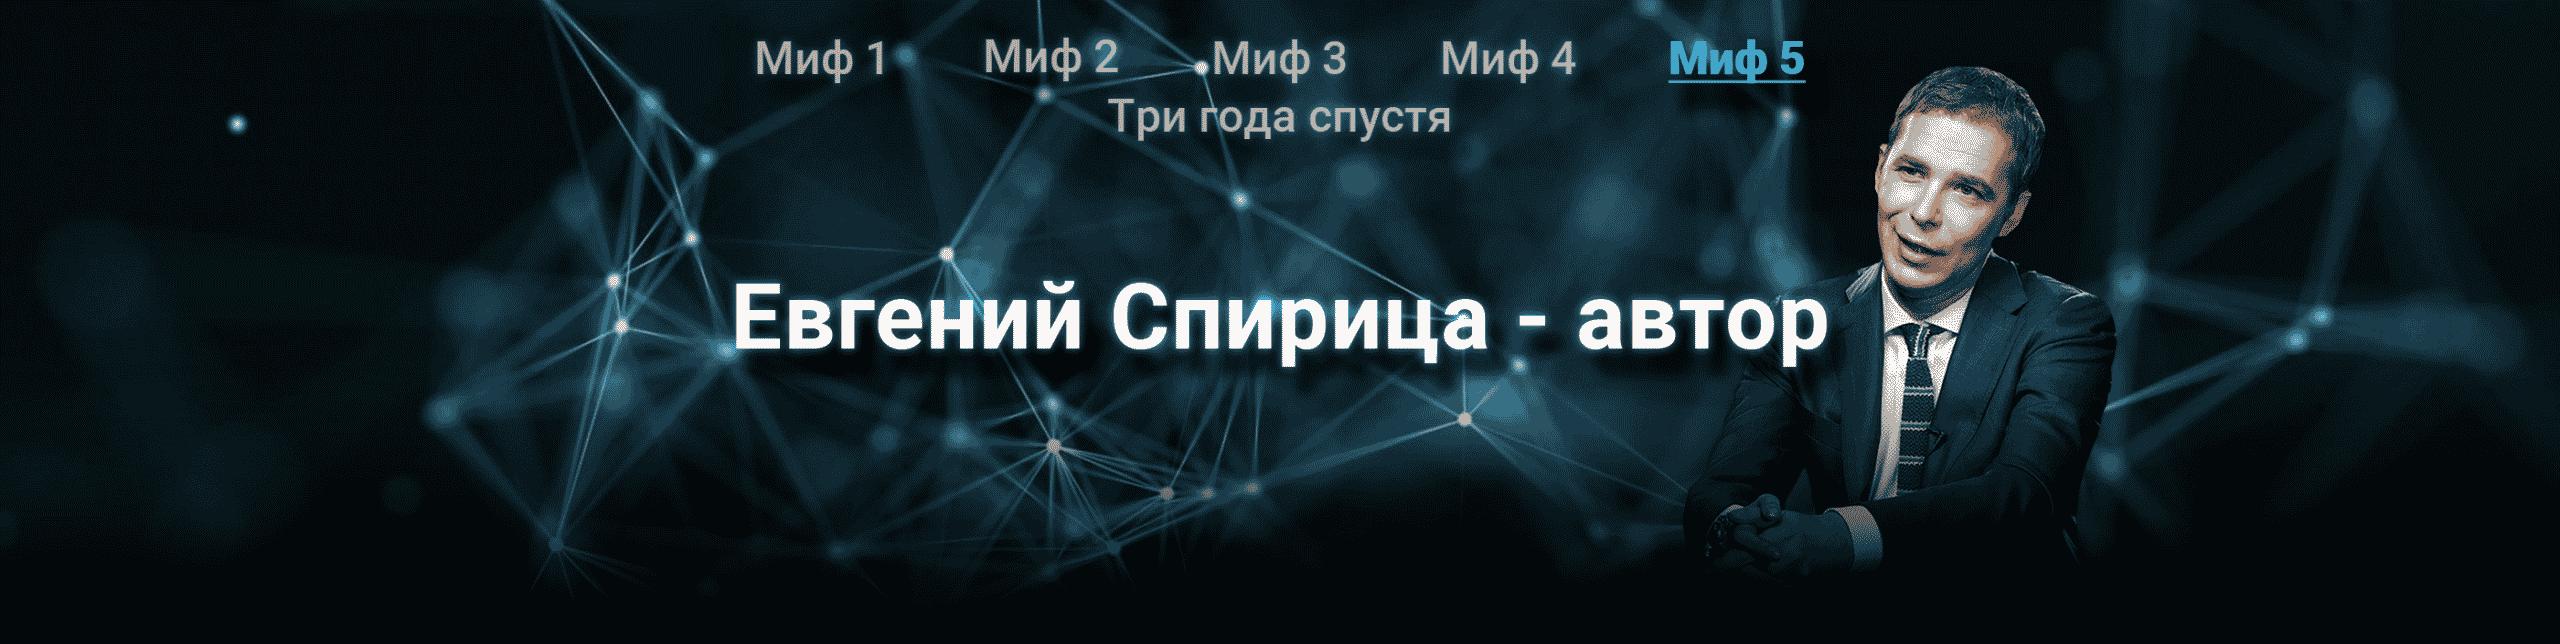 Евгений Спирица; Международная Академия Исследования Лжи; ICDS Group; Миф #5: Евгений Спирица — автор